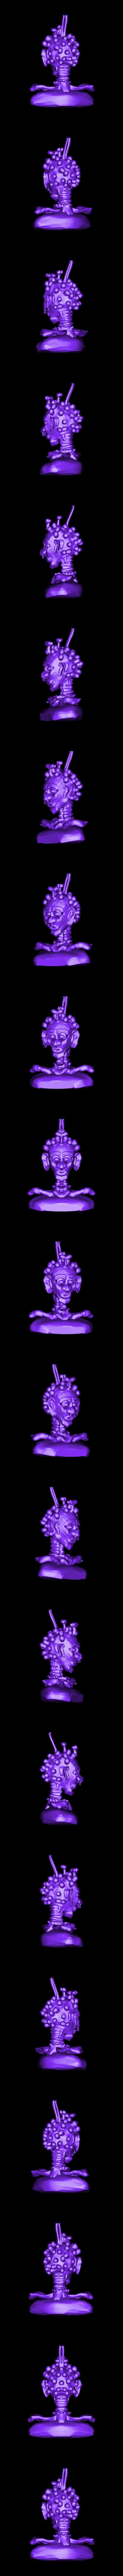 shaman africaine.stl Download STL file African Shaman (fantastic busts series) • 3D print template, Majin59